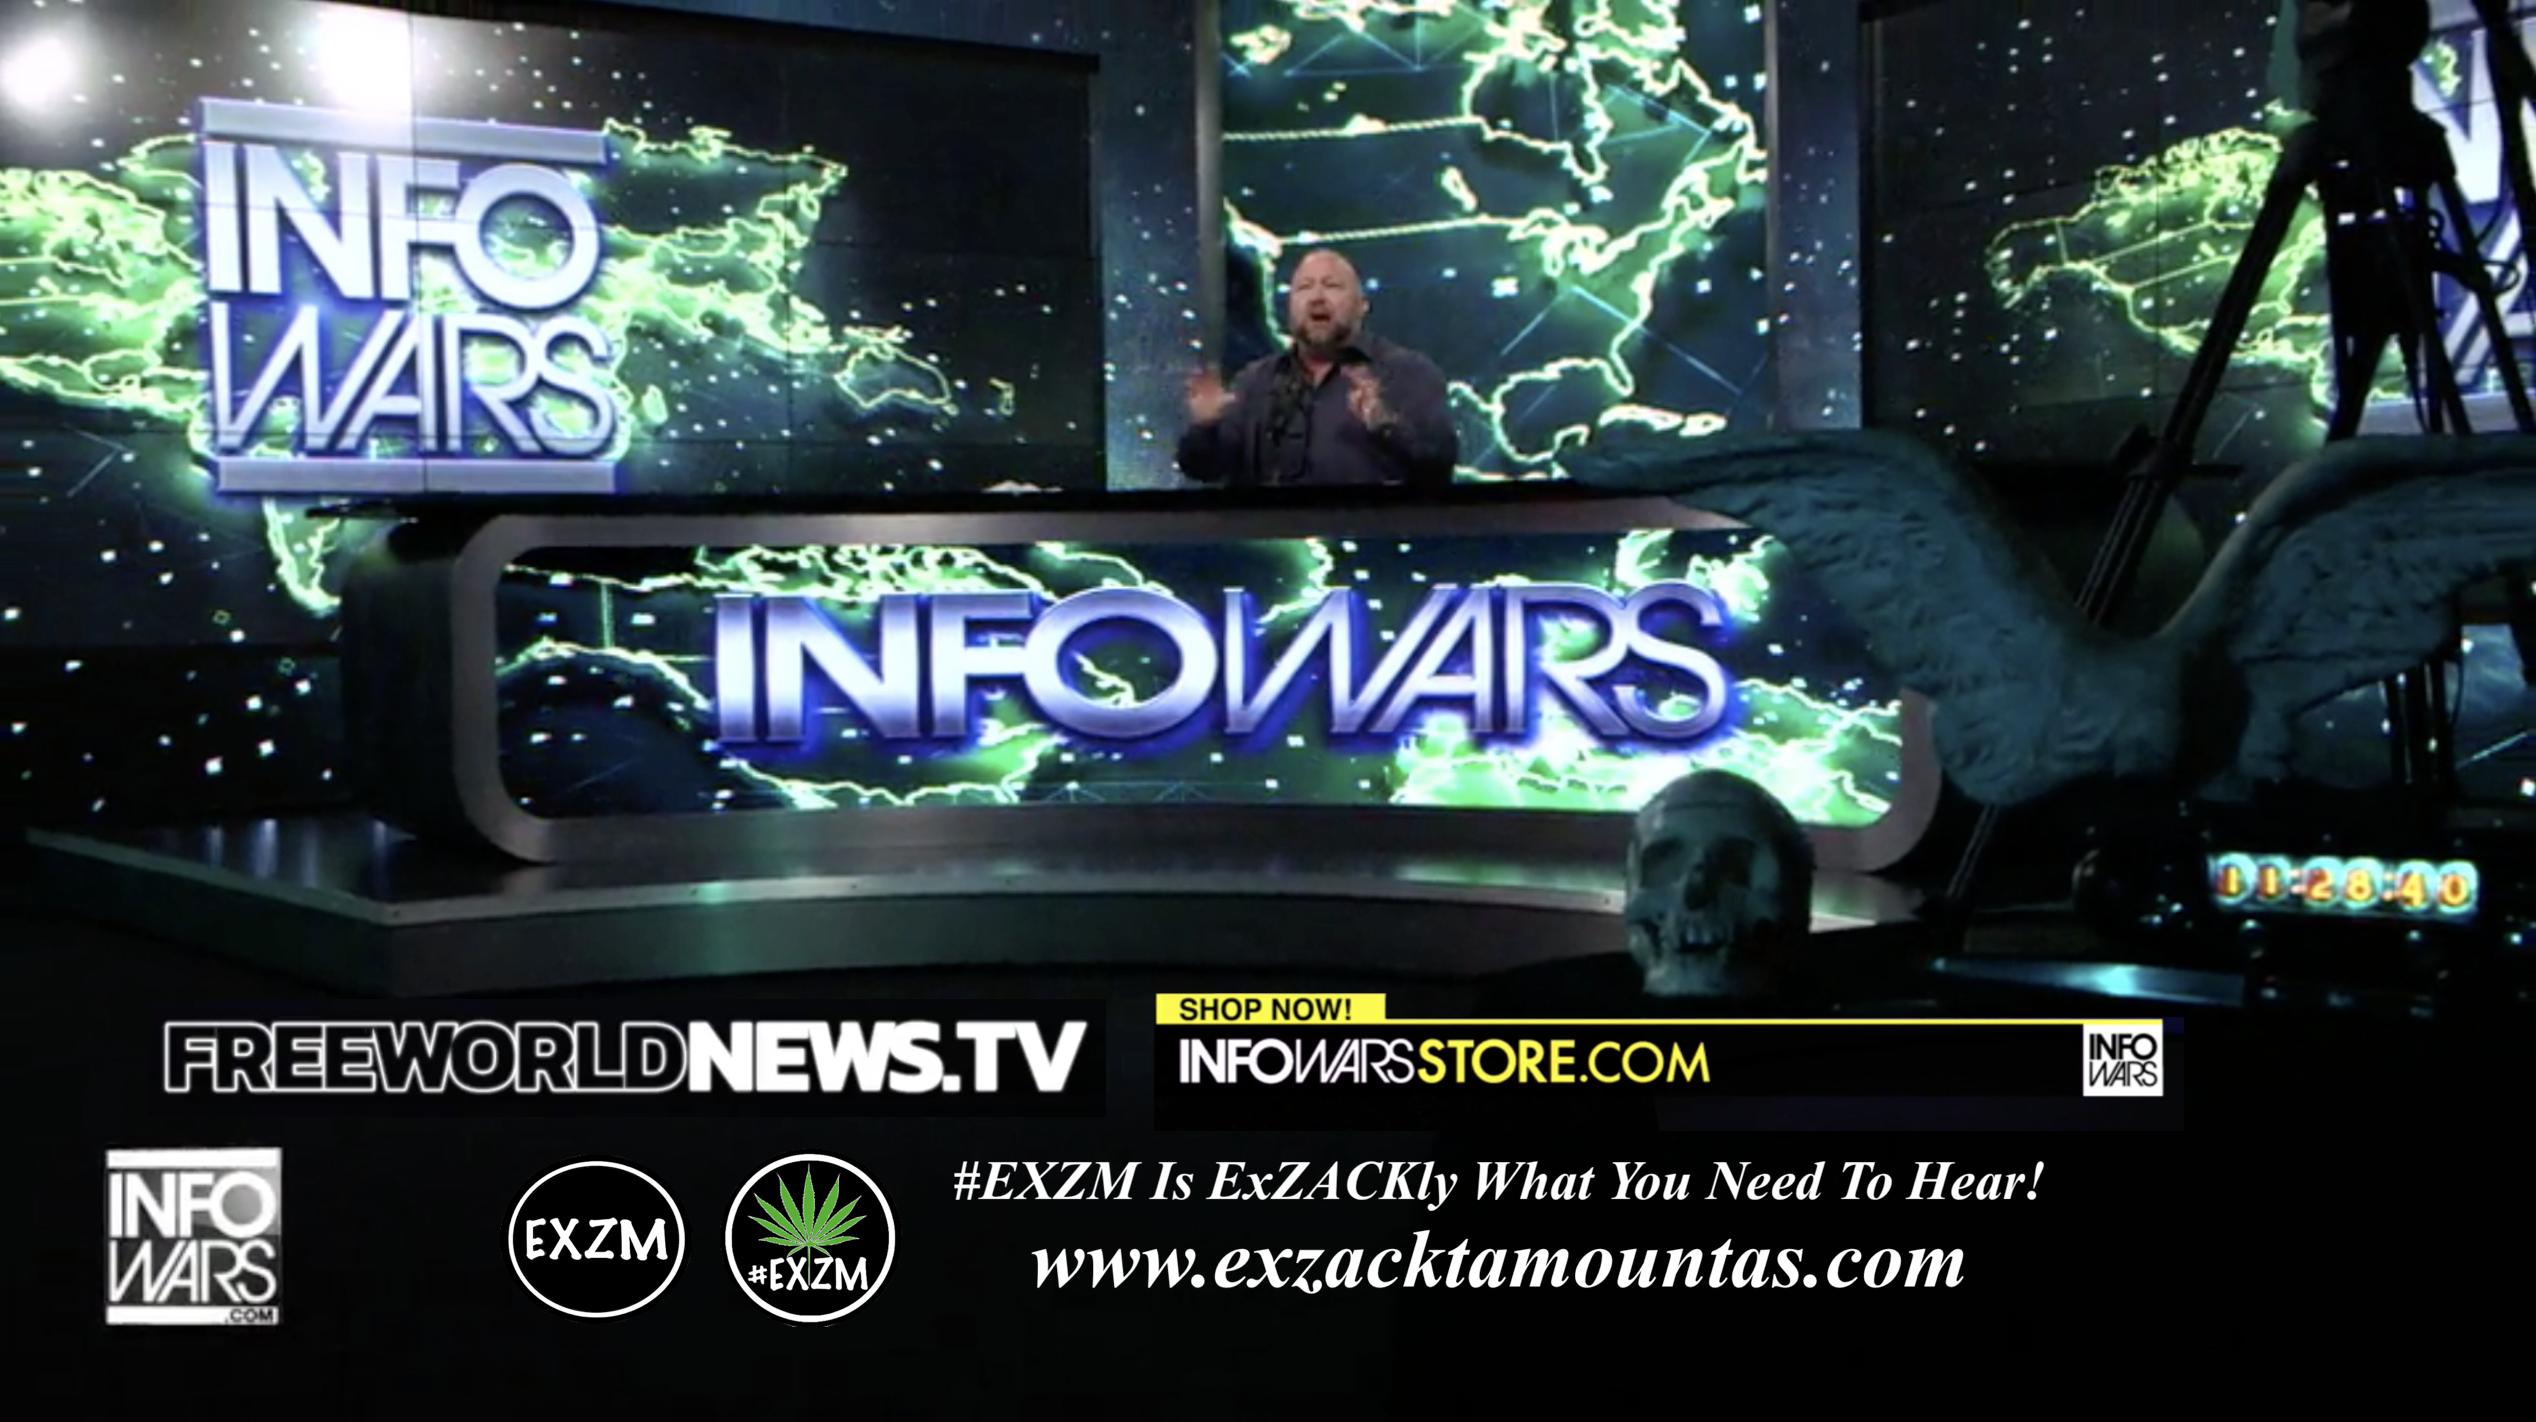 Alex Jones Live In Infowars Studio Human Skull Angel Wings Dagger Free World News TV EXZM Zack Mount June 23rd 2021 copy 2